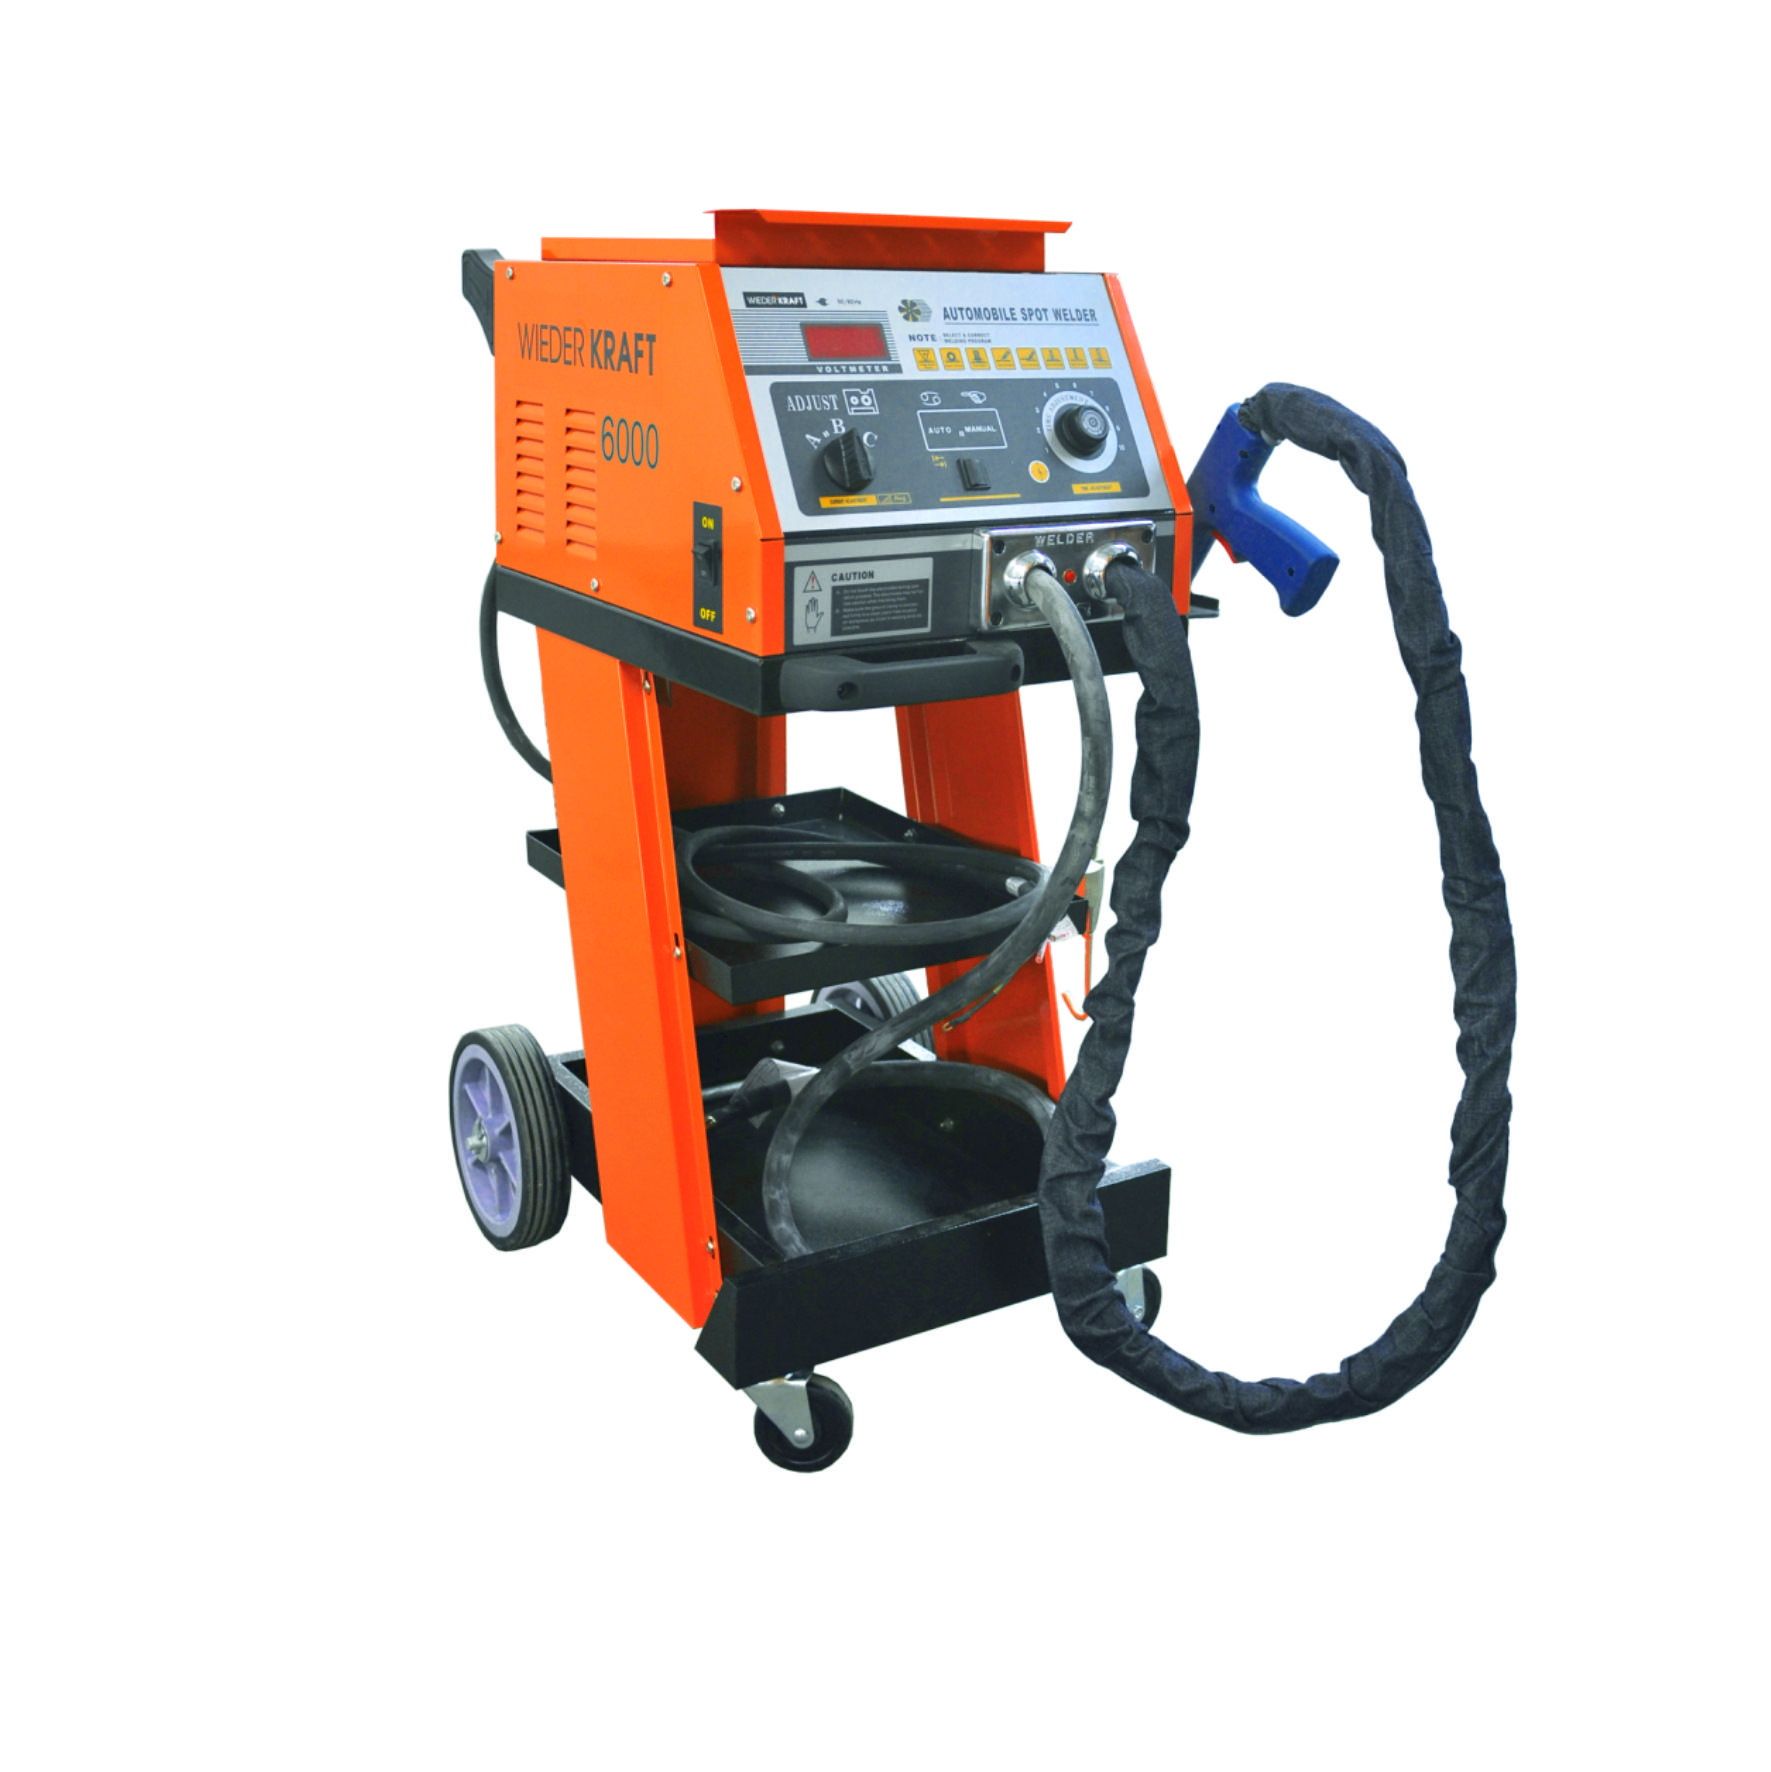 Сварочный аппарат Wiederkraft Wdk-7000